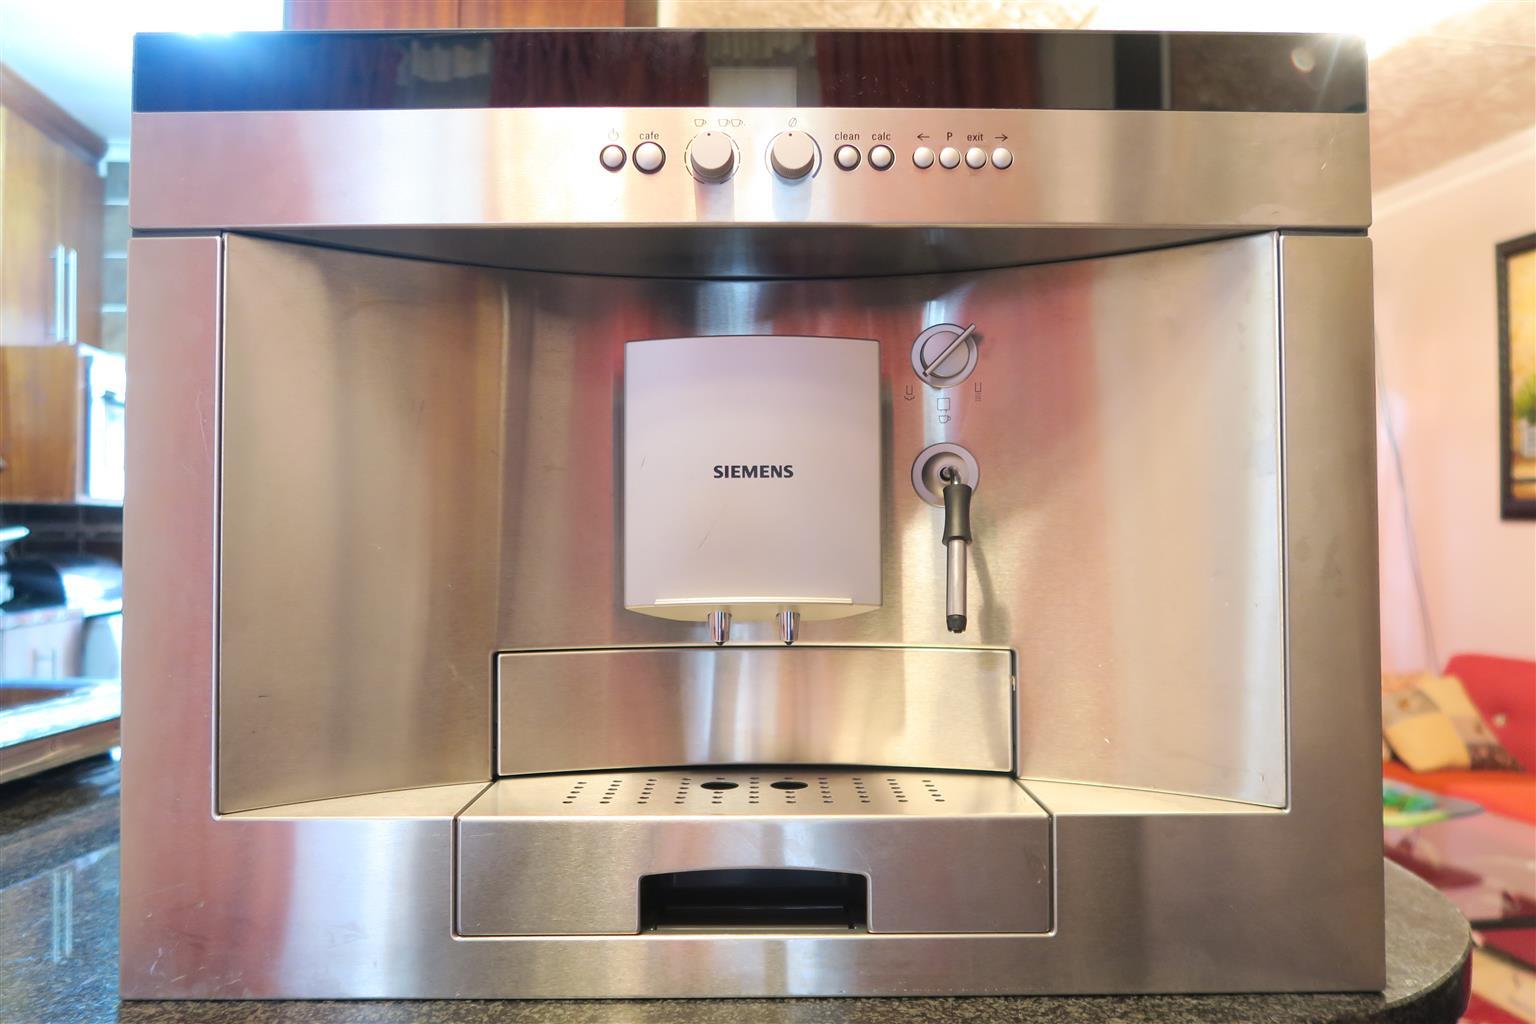 Siemens Fully Automatic Coffee Maker TK68E570